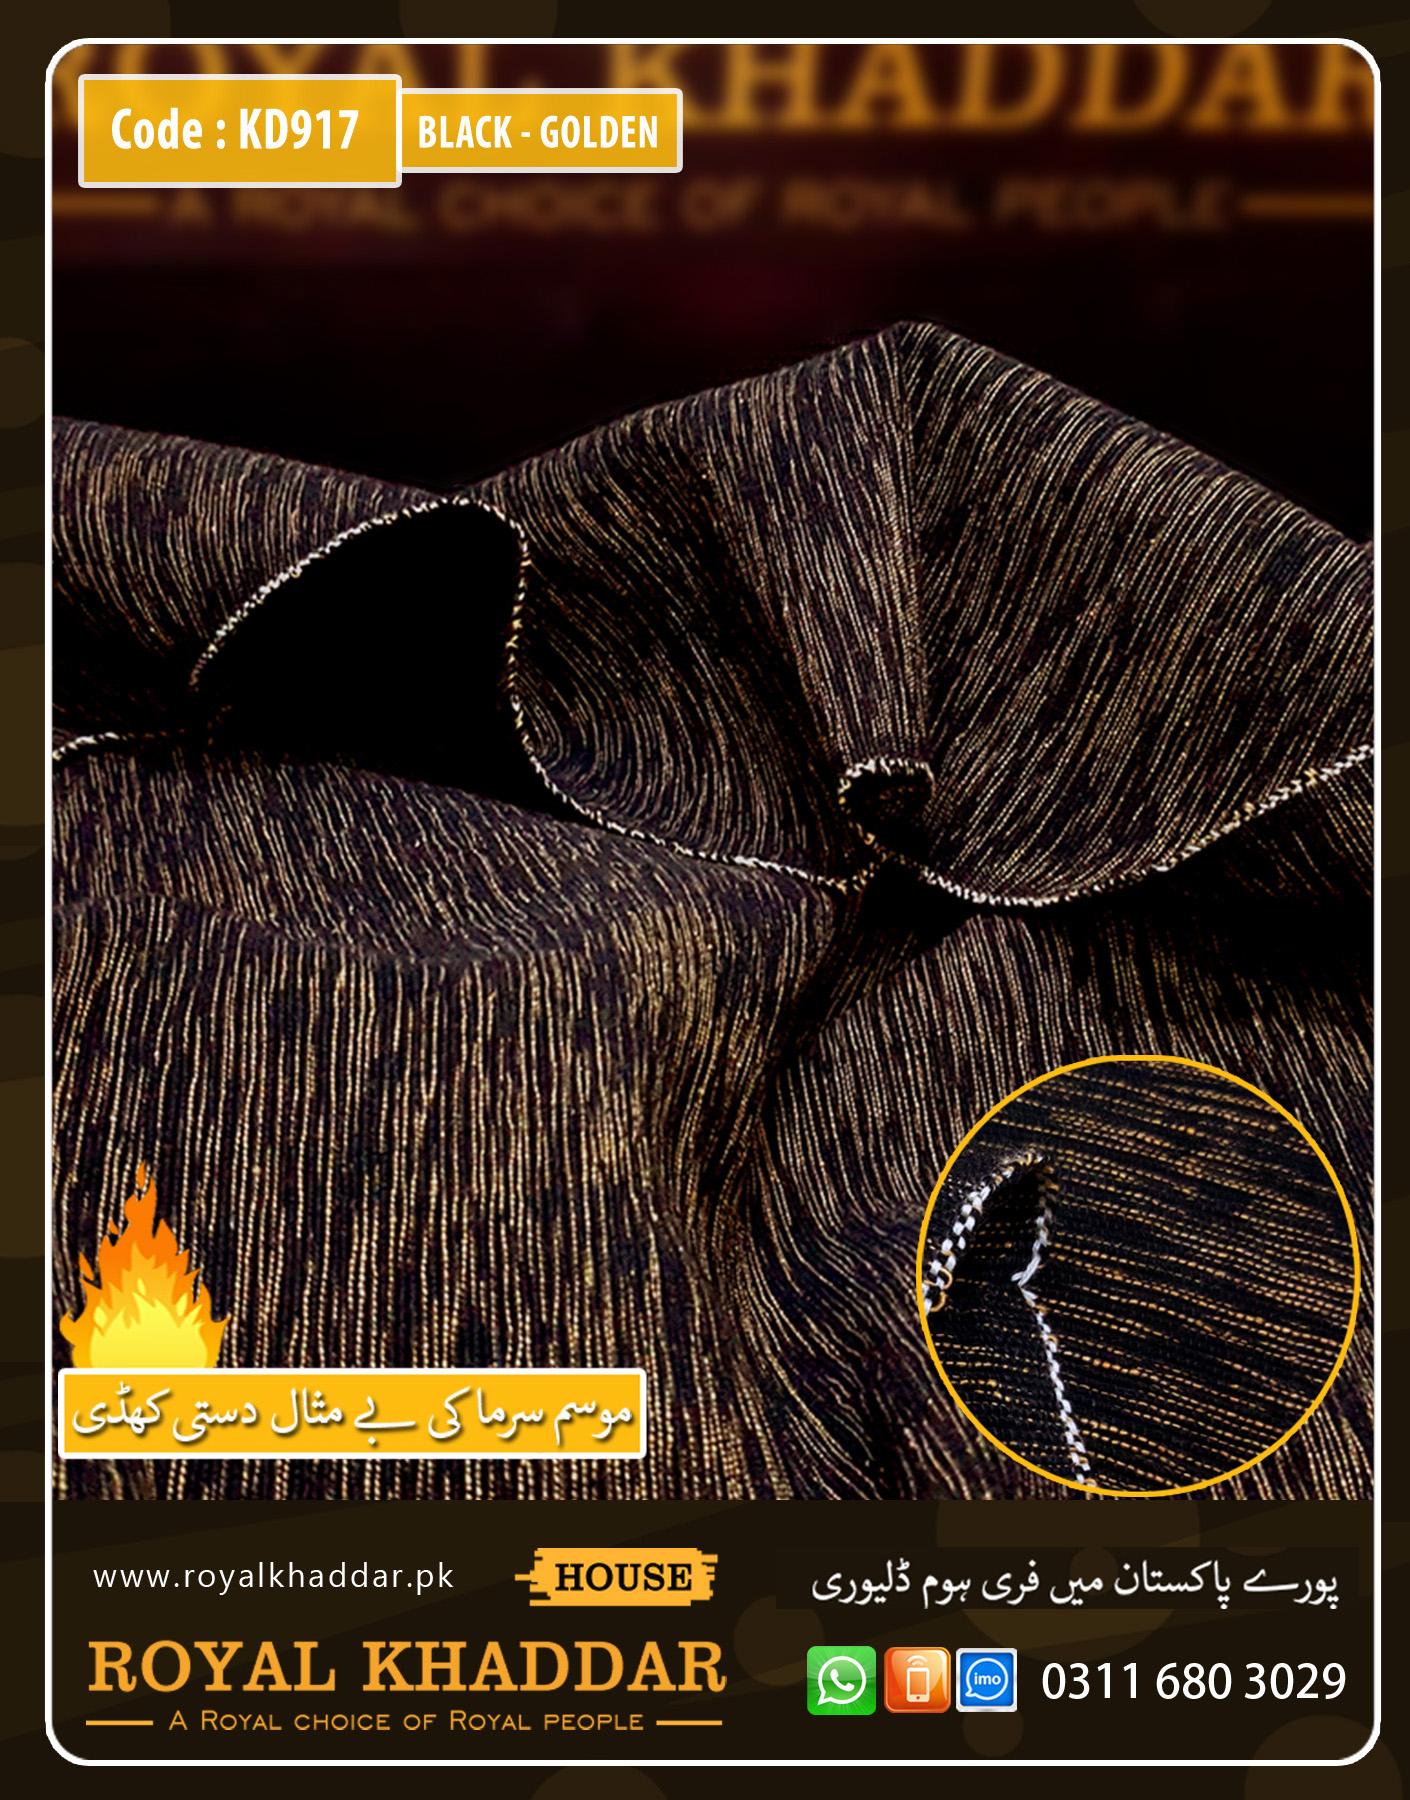 Black - Golden Handmade Khaddi